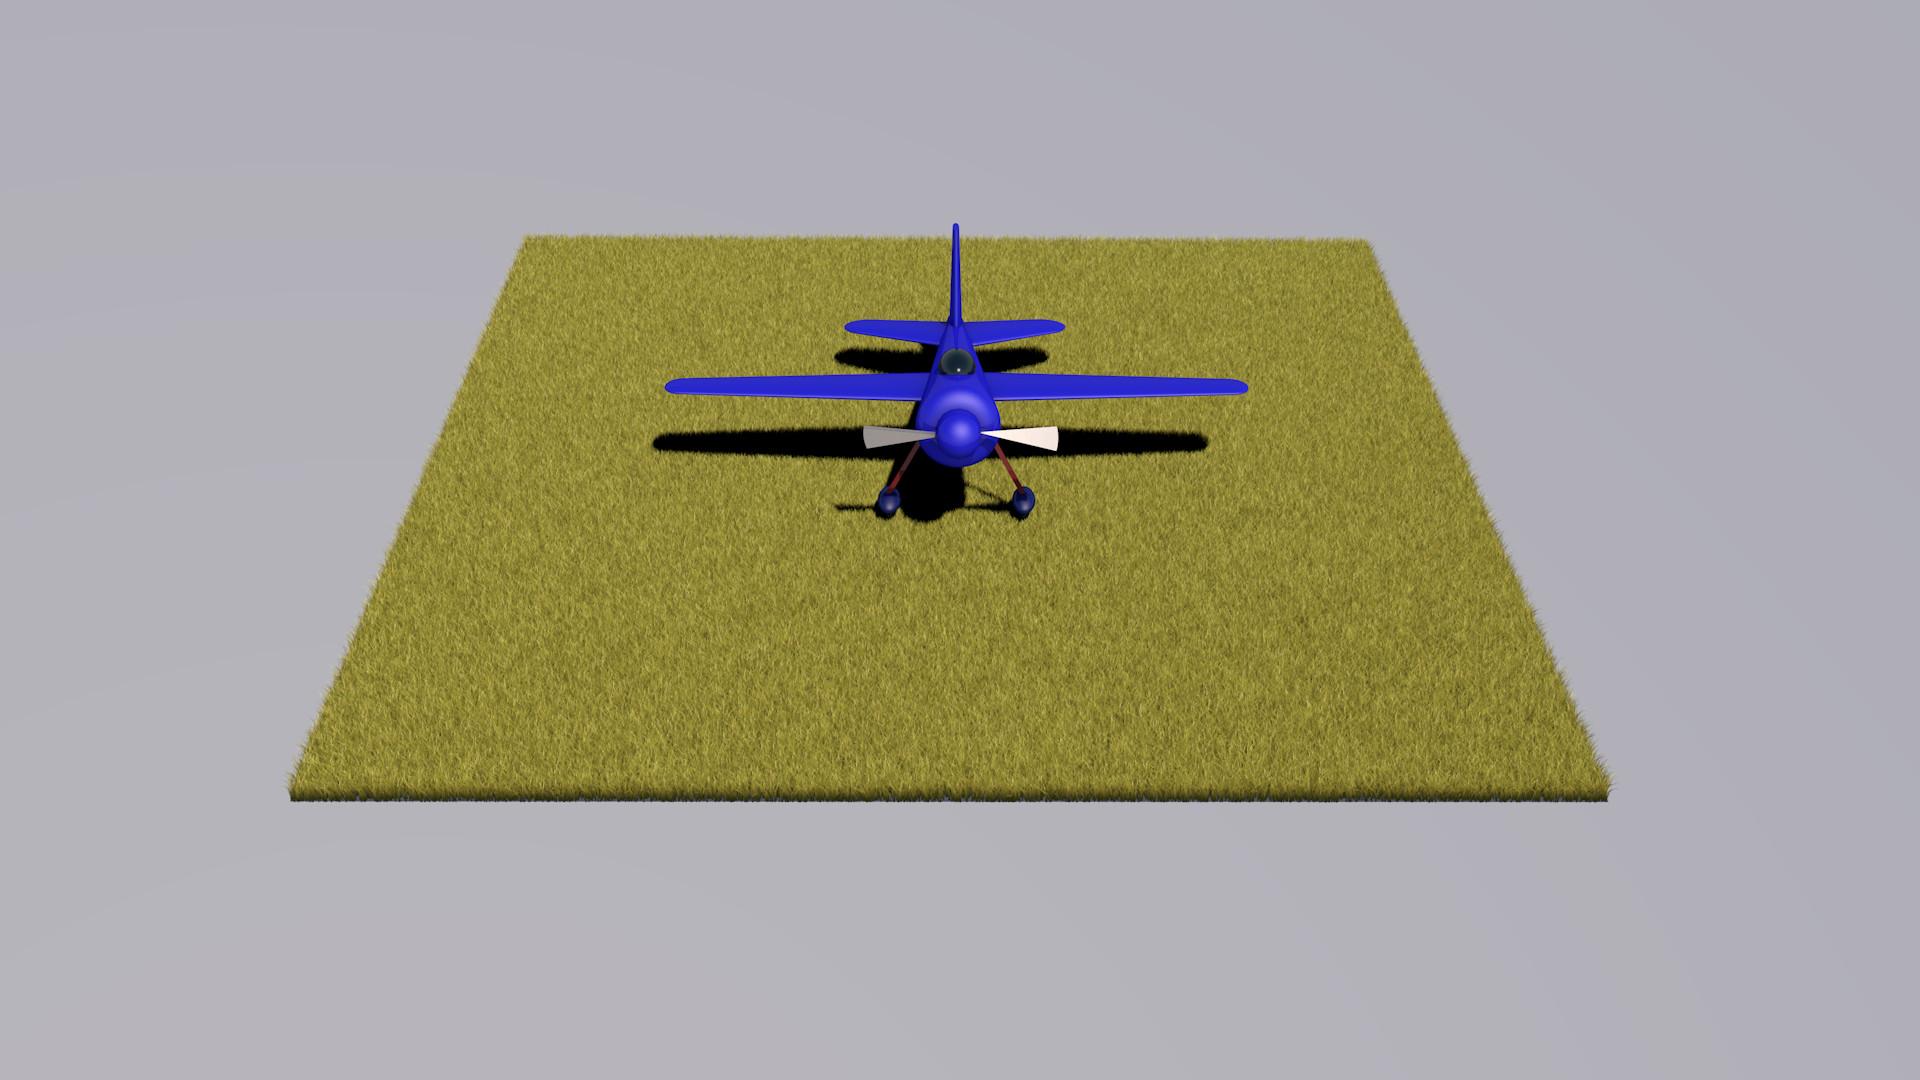 Jacob Science - Cinema 4D Cartoon Style Plane